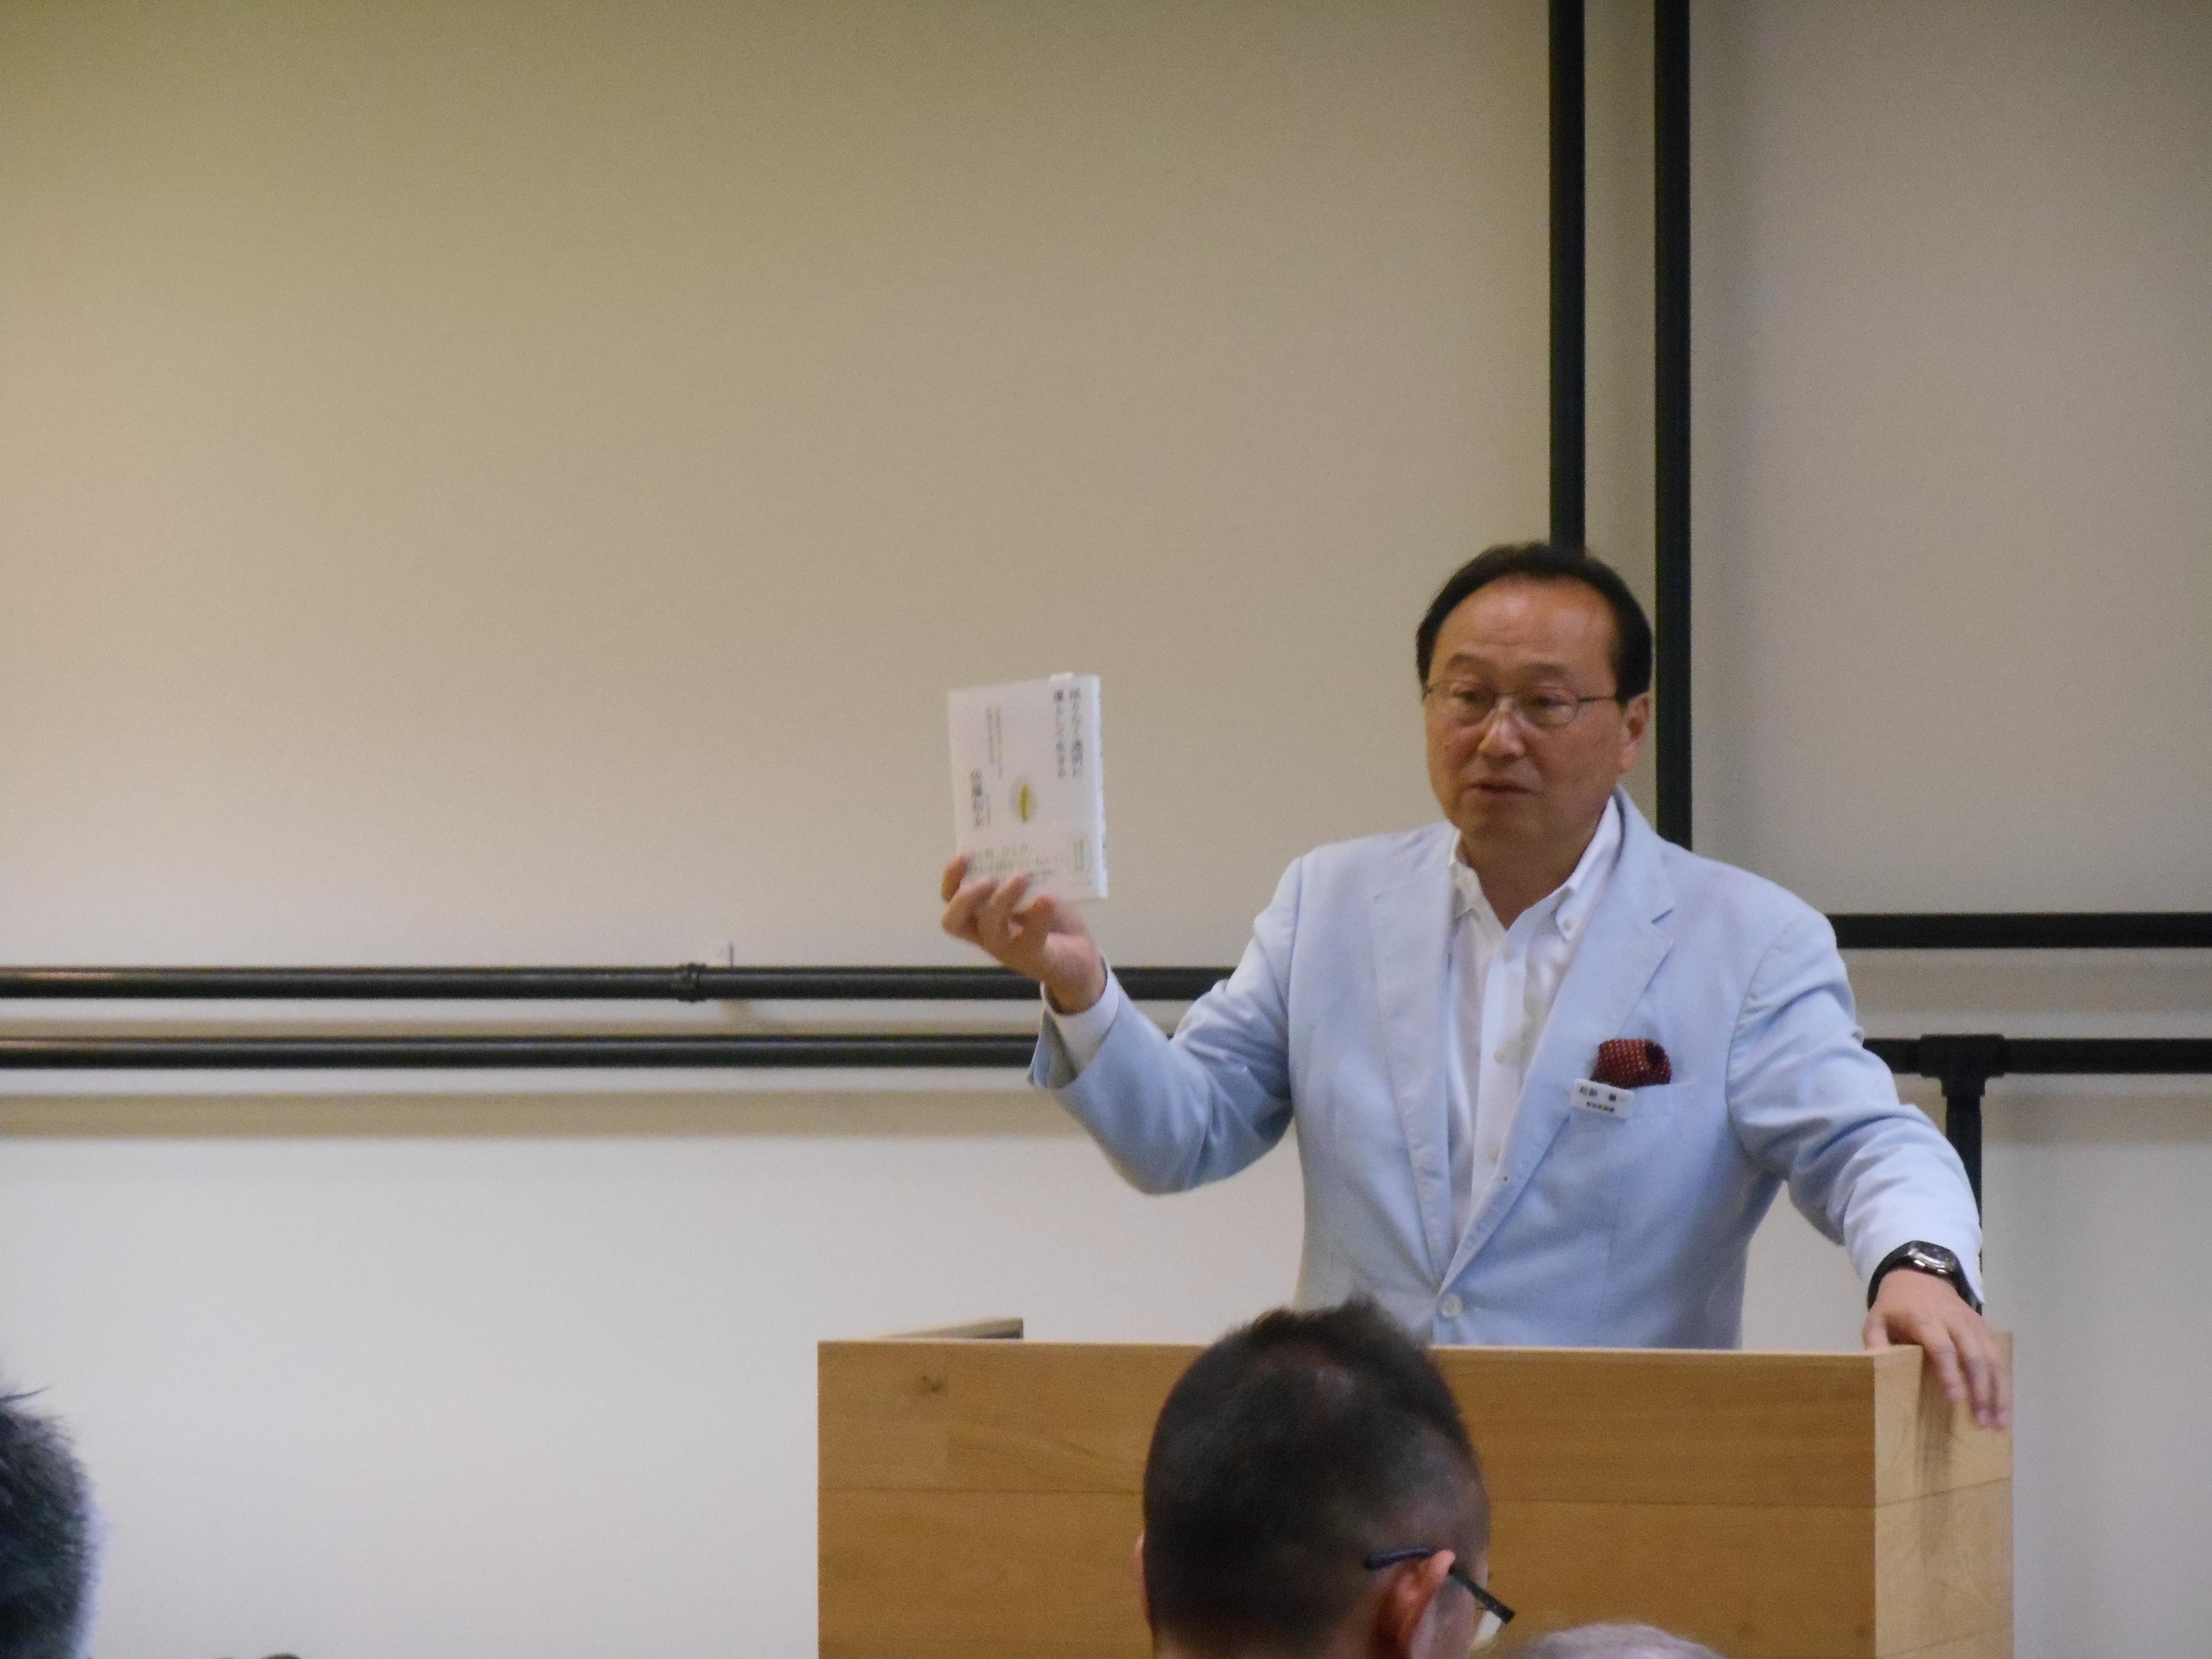 DSCN3709 - 4月1日東京思風塾の開催になります。